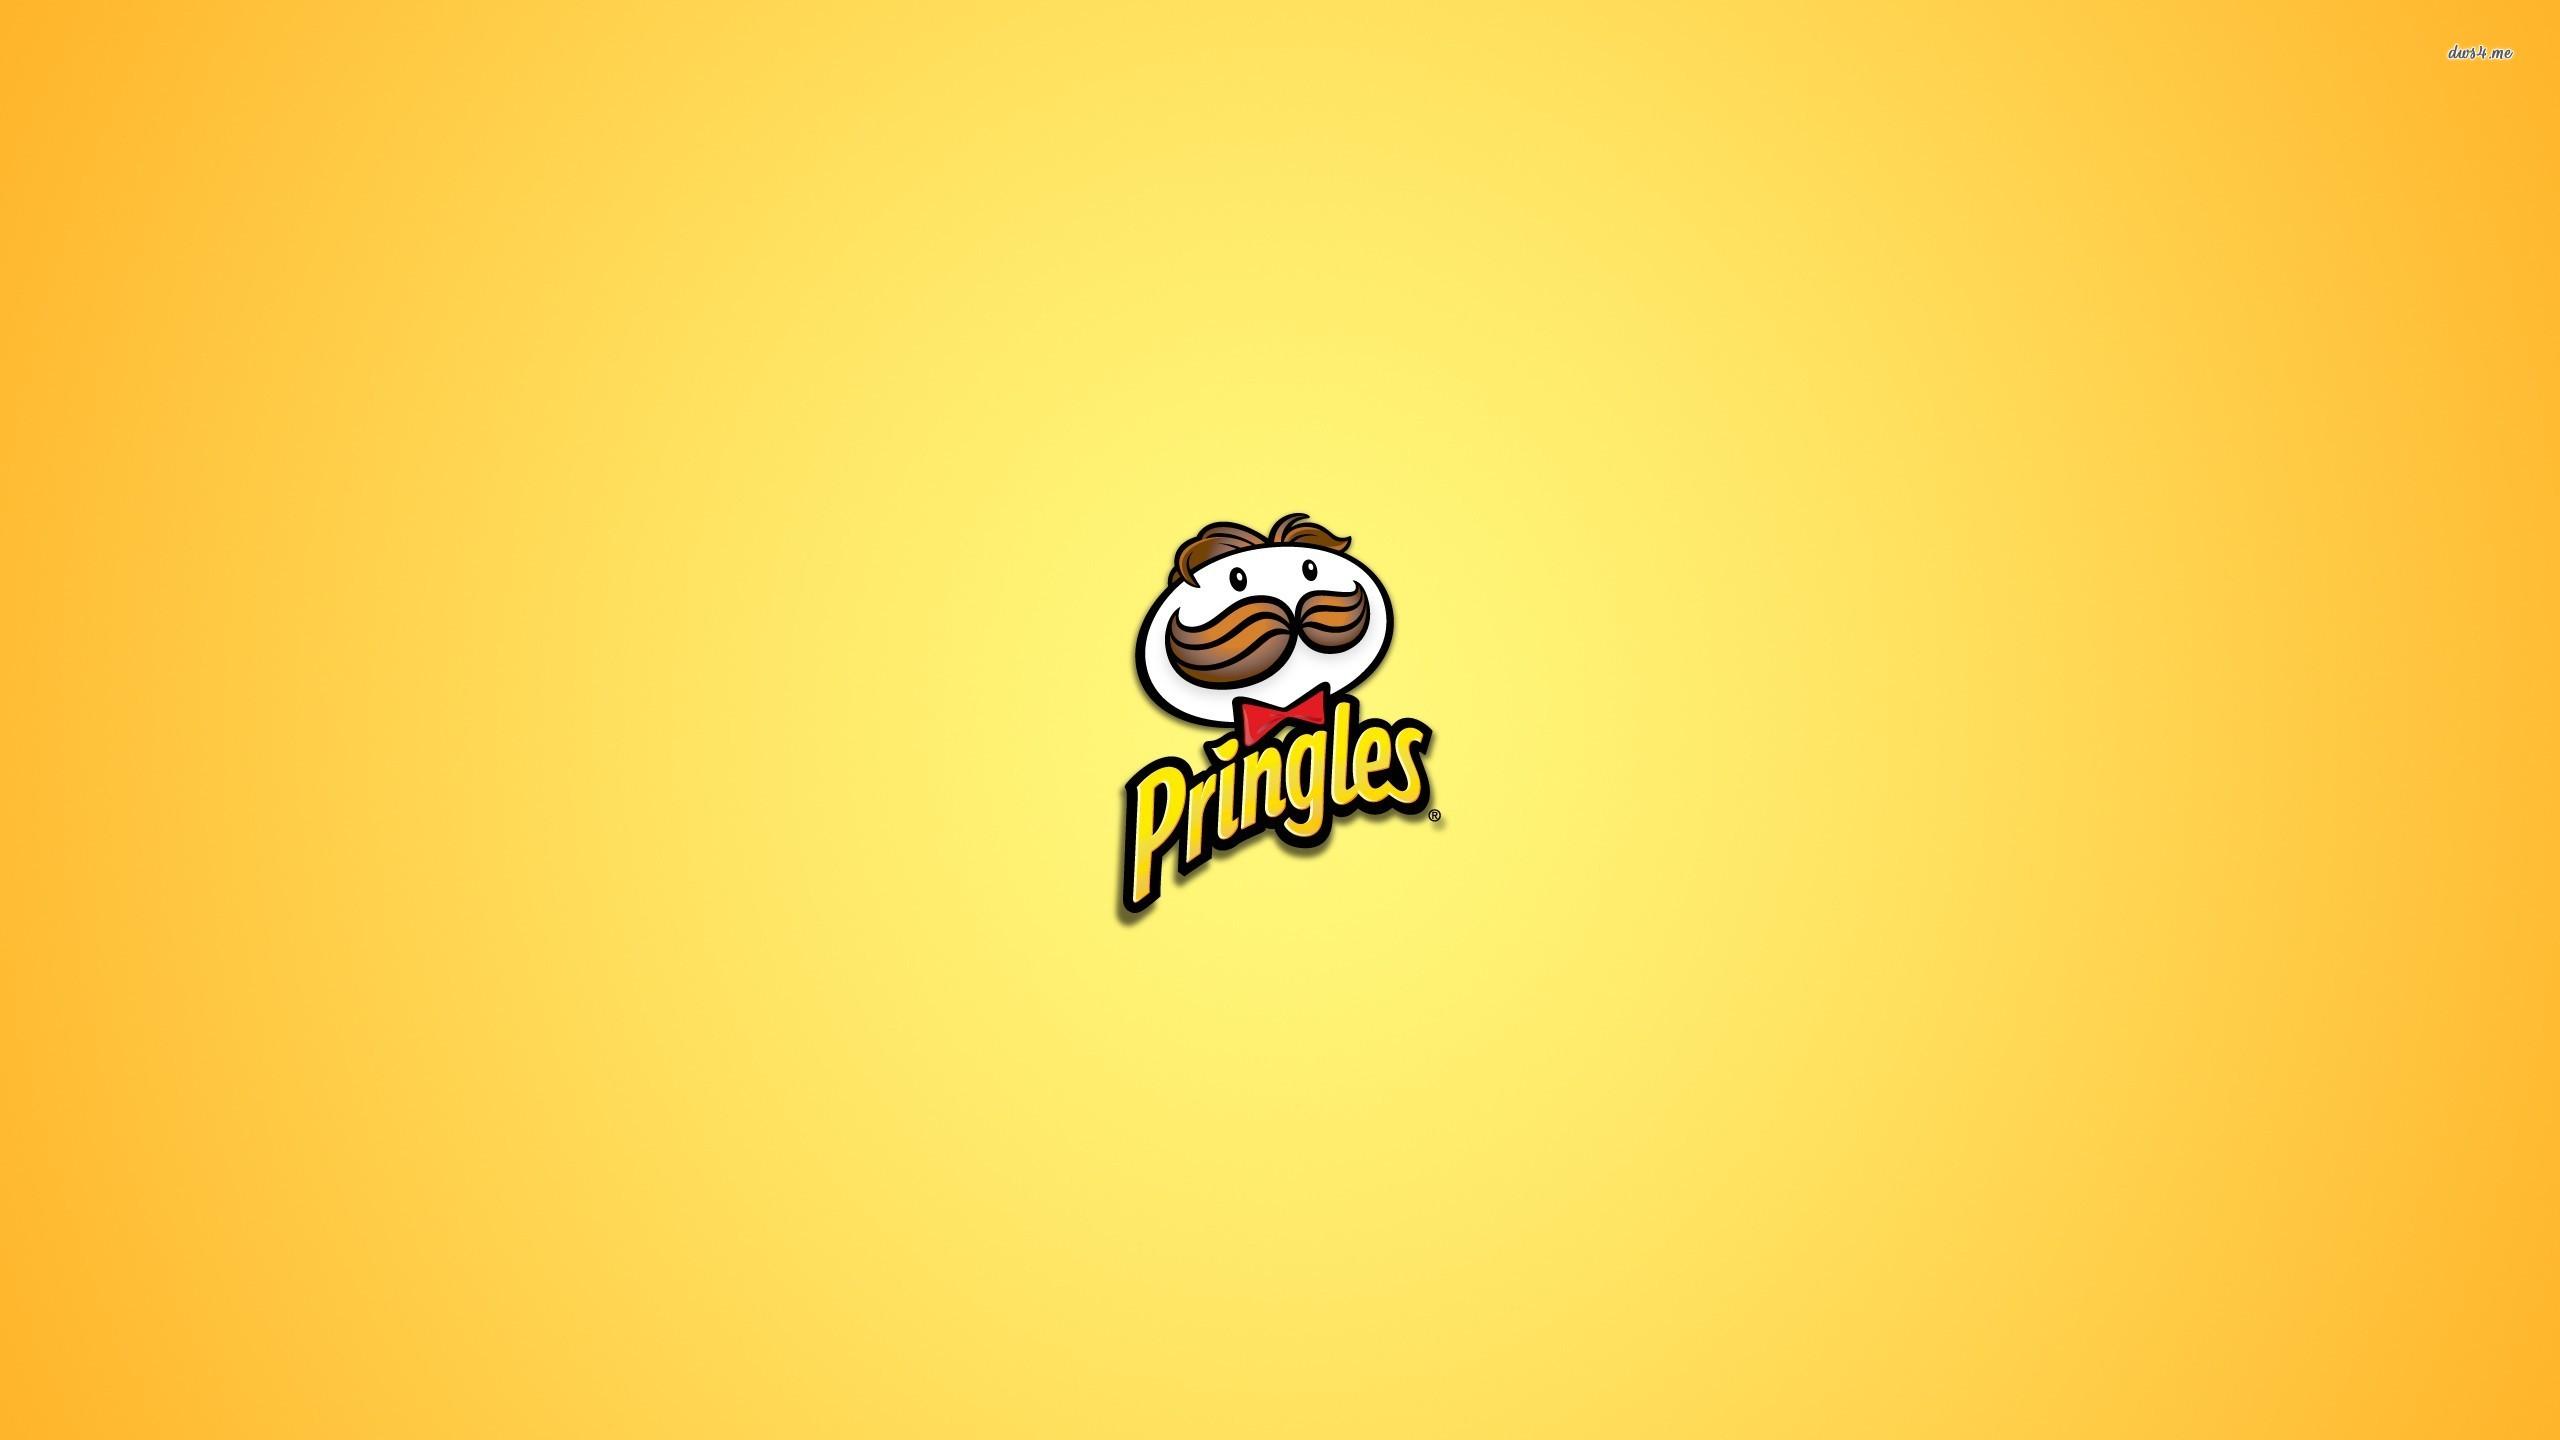 Pringles wallpaper   Minimalistic wallpapers   39872 2560x1440